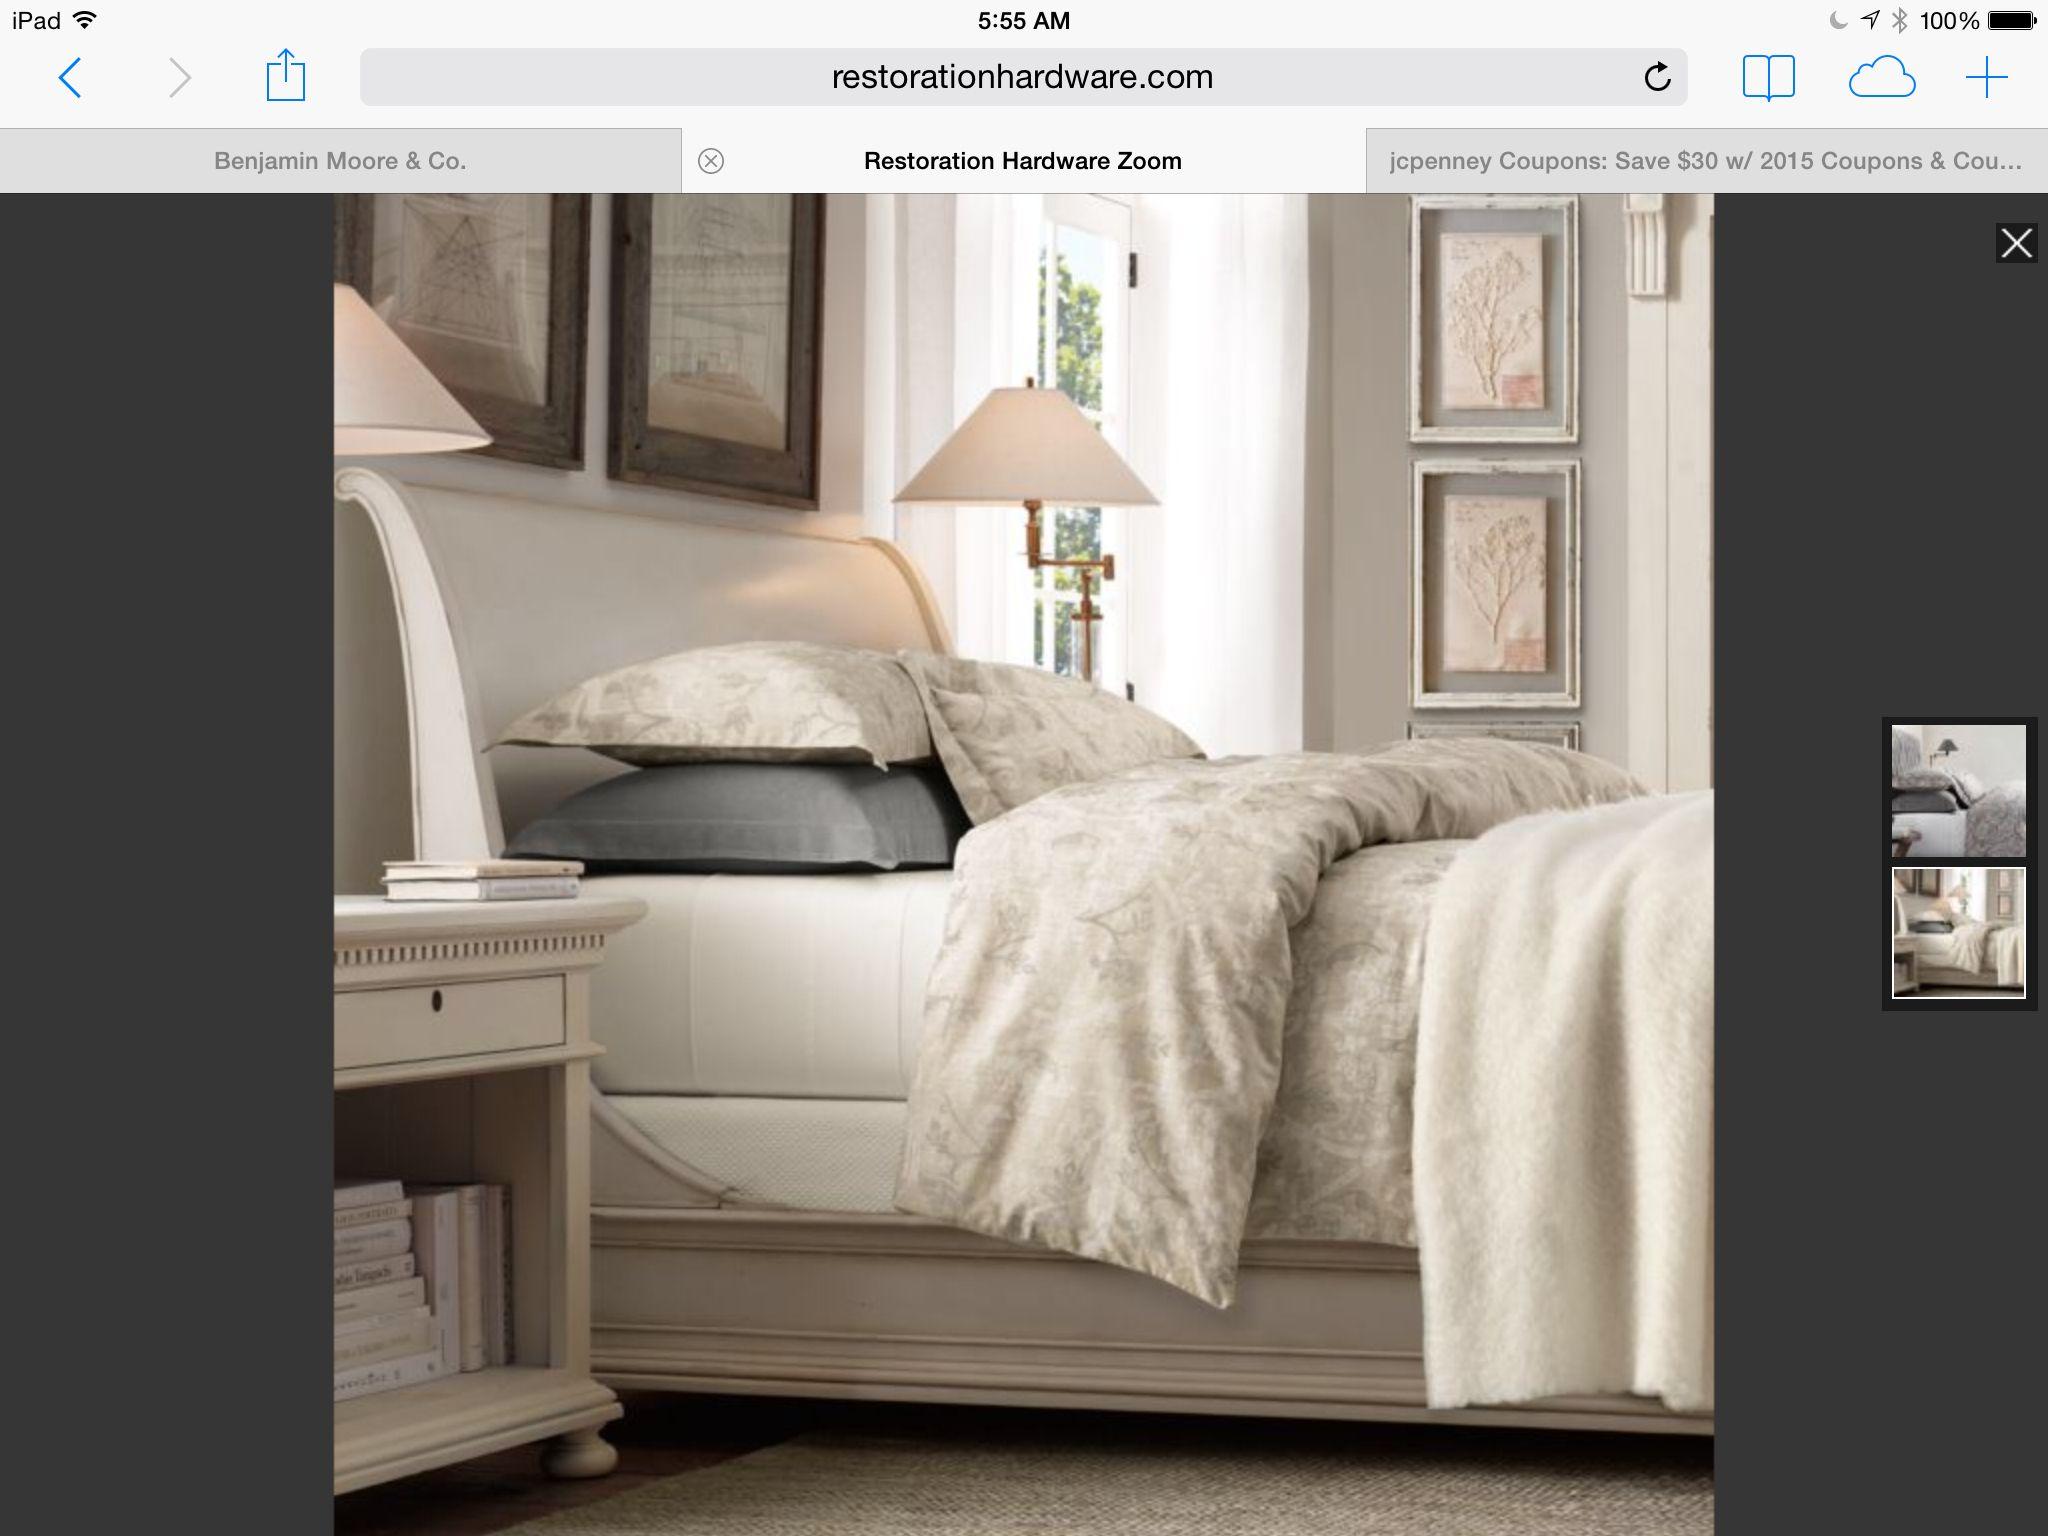 Restoration Hardware. Sleigh beds, Bed, Home decor